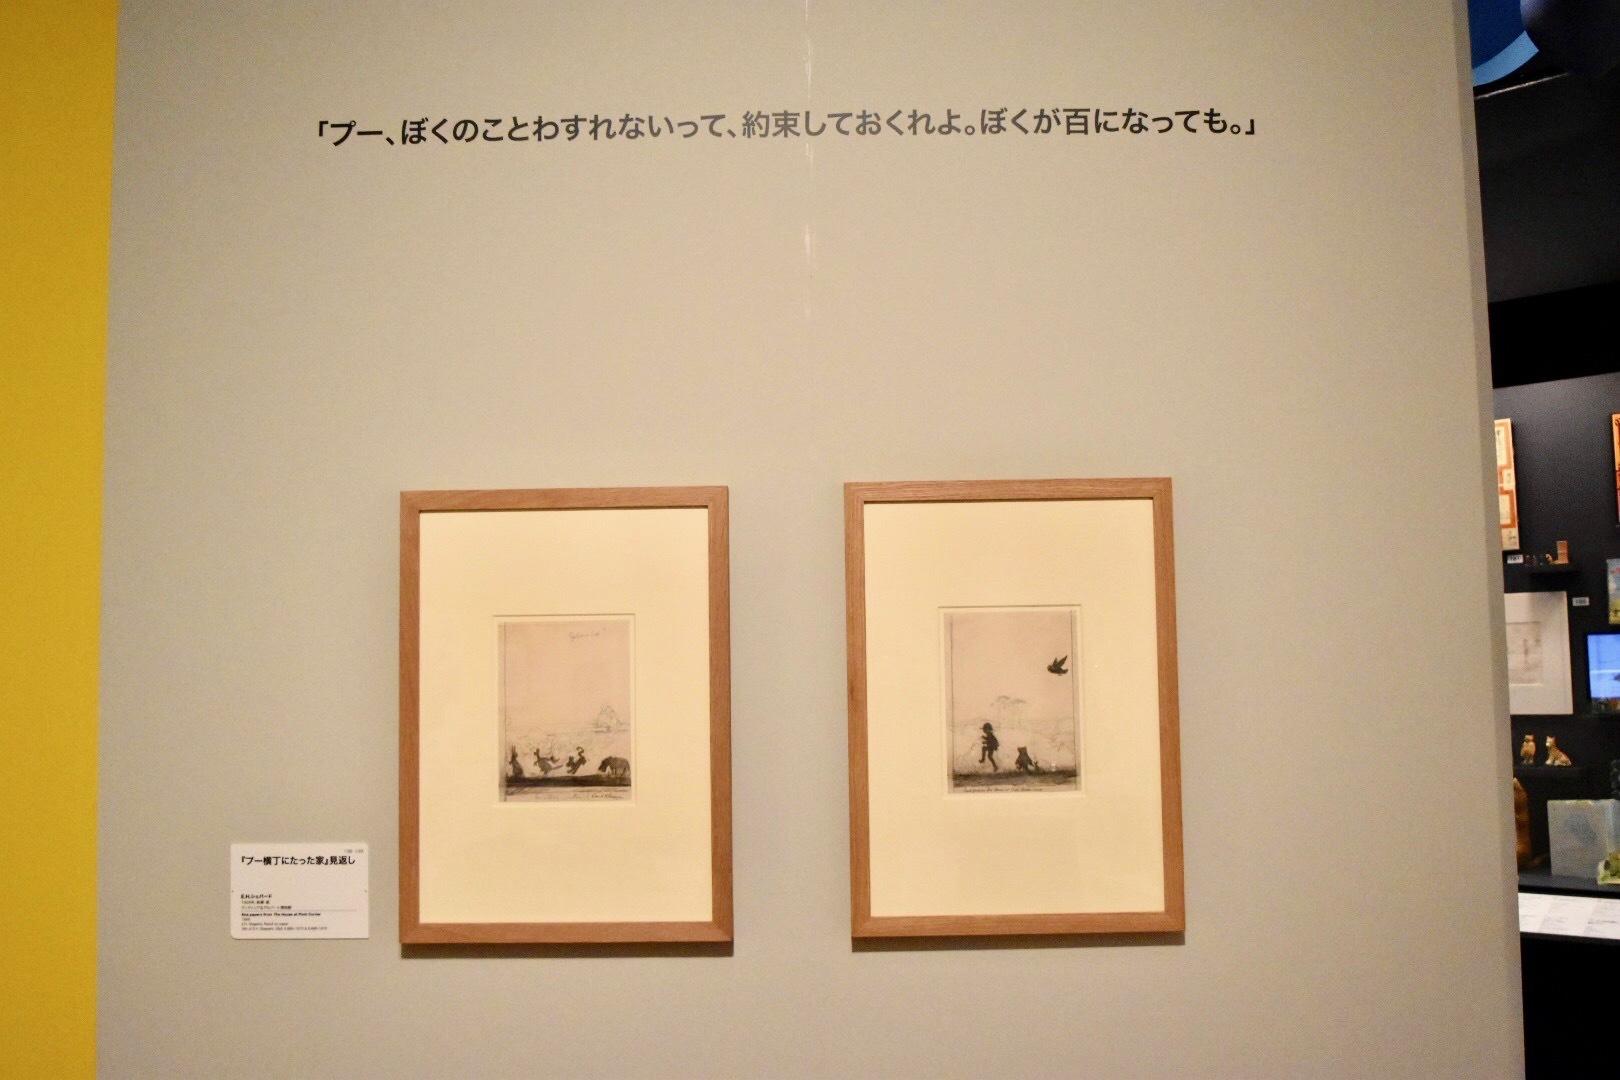 E.H.シェパード 『プー横丁にたった家』見返し 1928年 ヴィクトリア・アンド・アルバート博物館所蔵